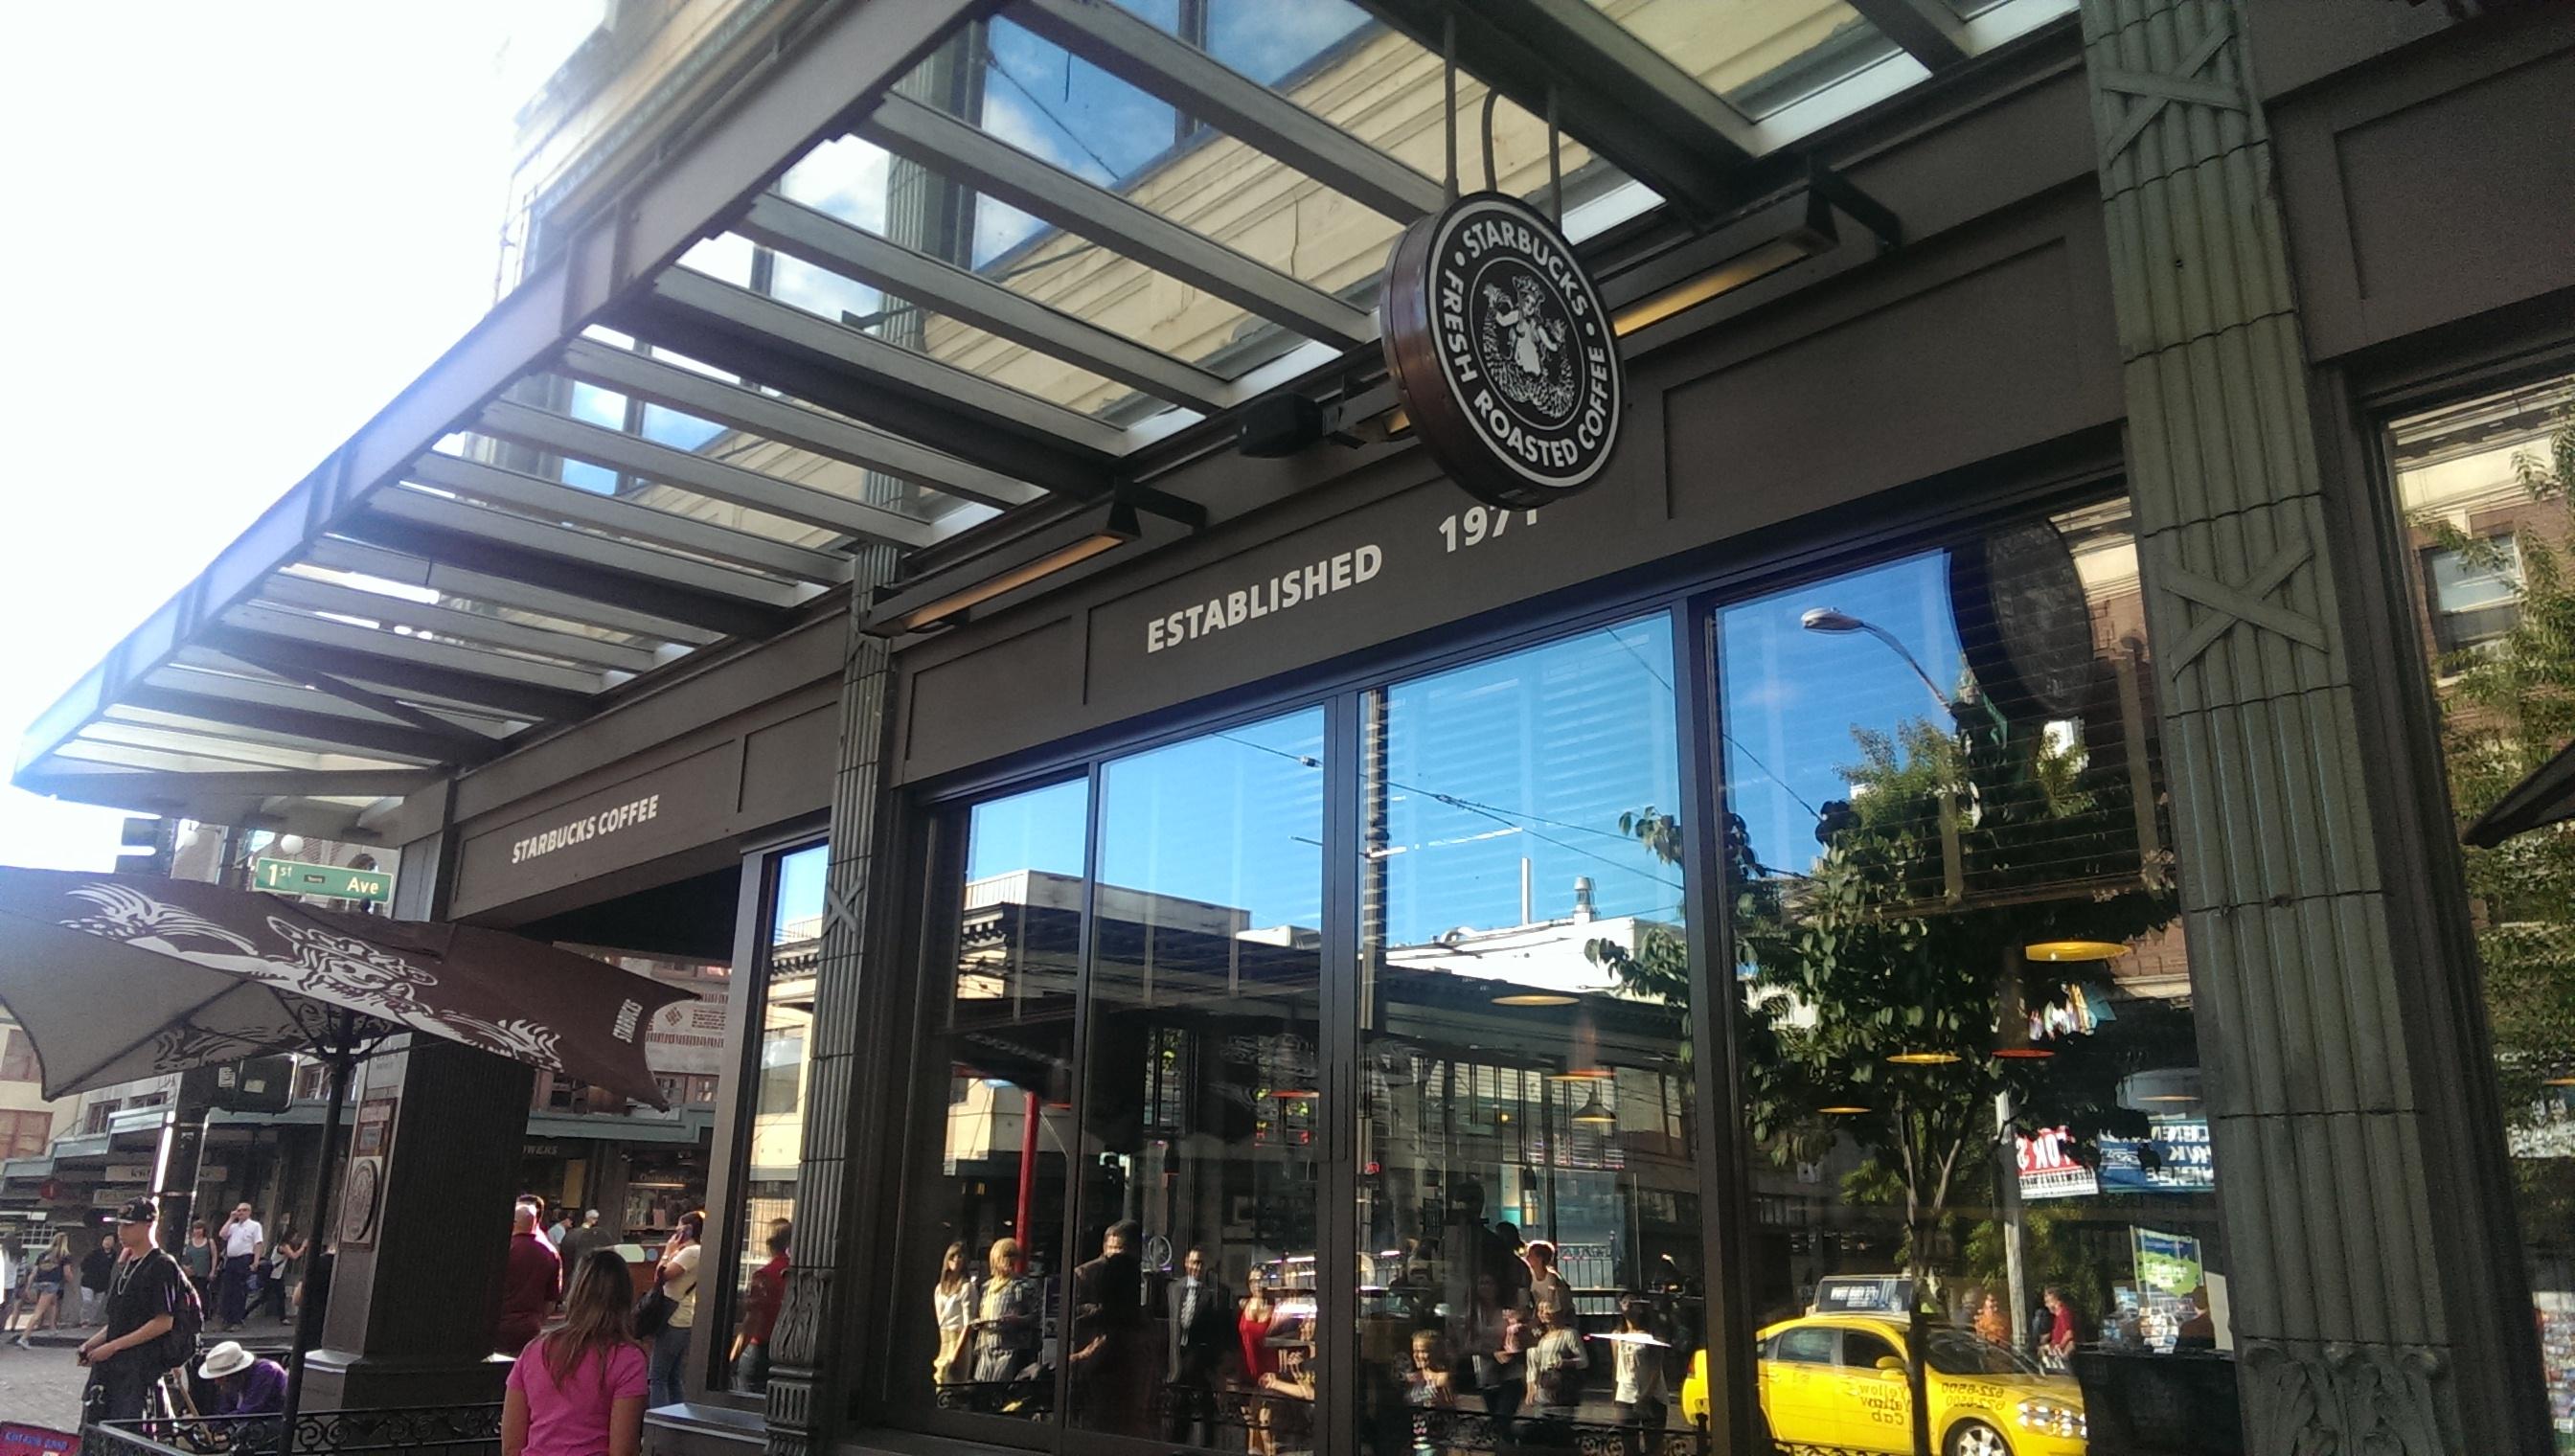 TGG's coffee run at Starbucks Capital